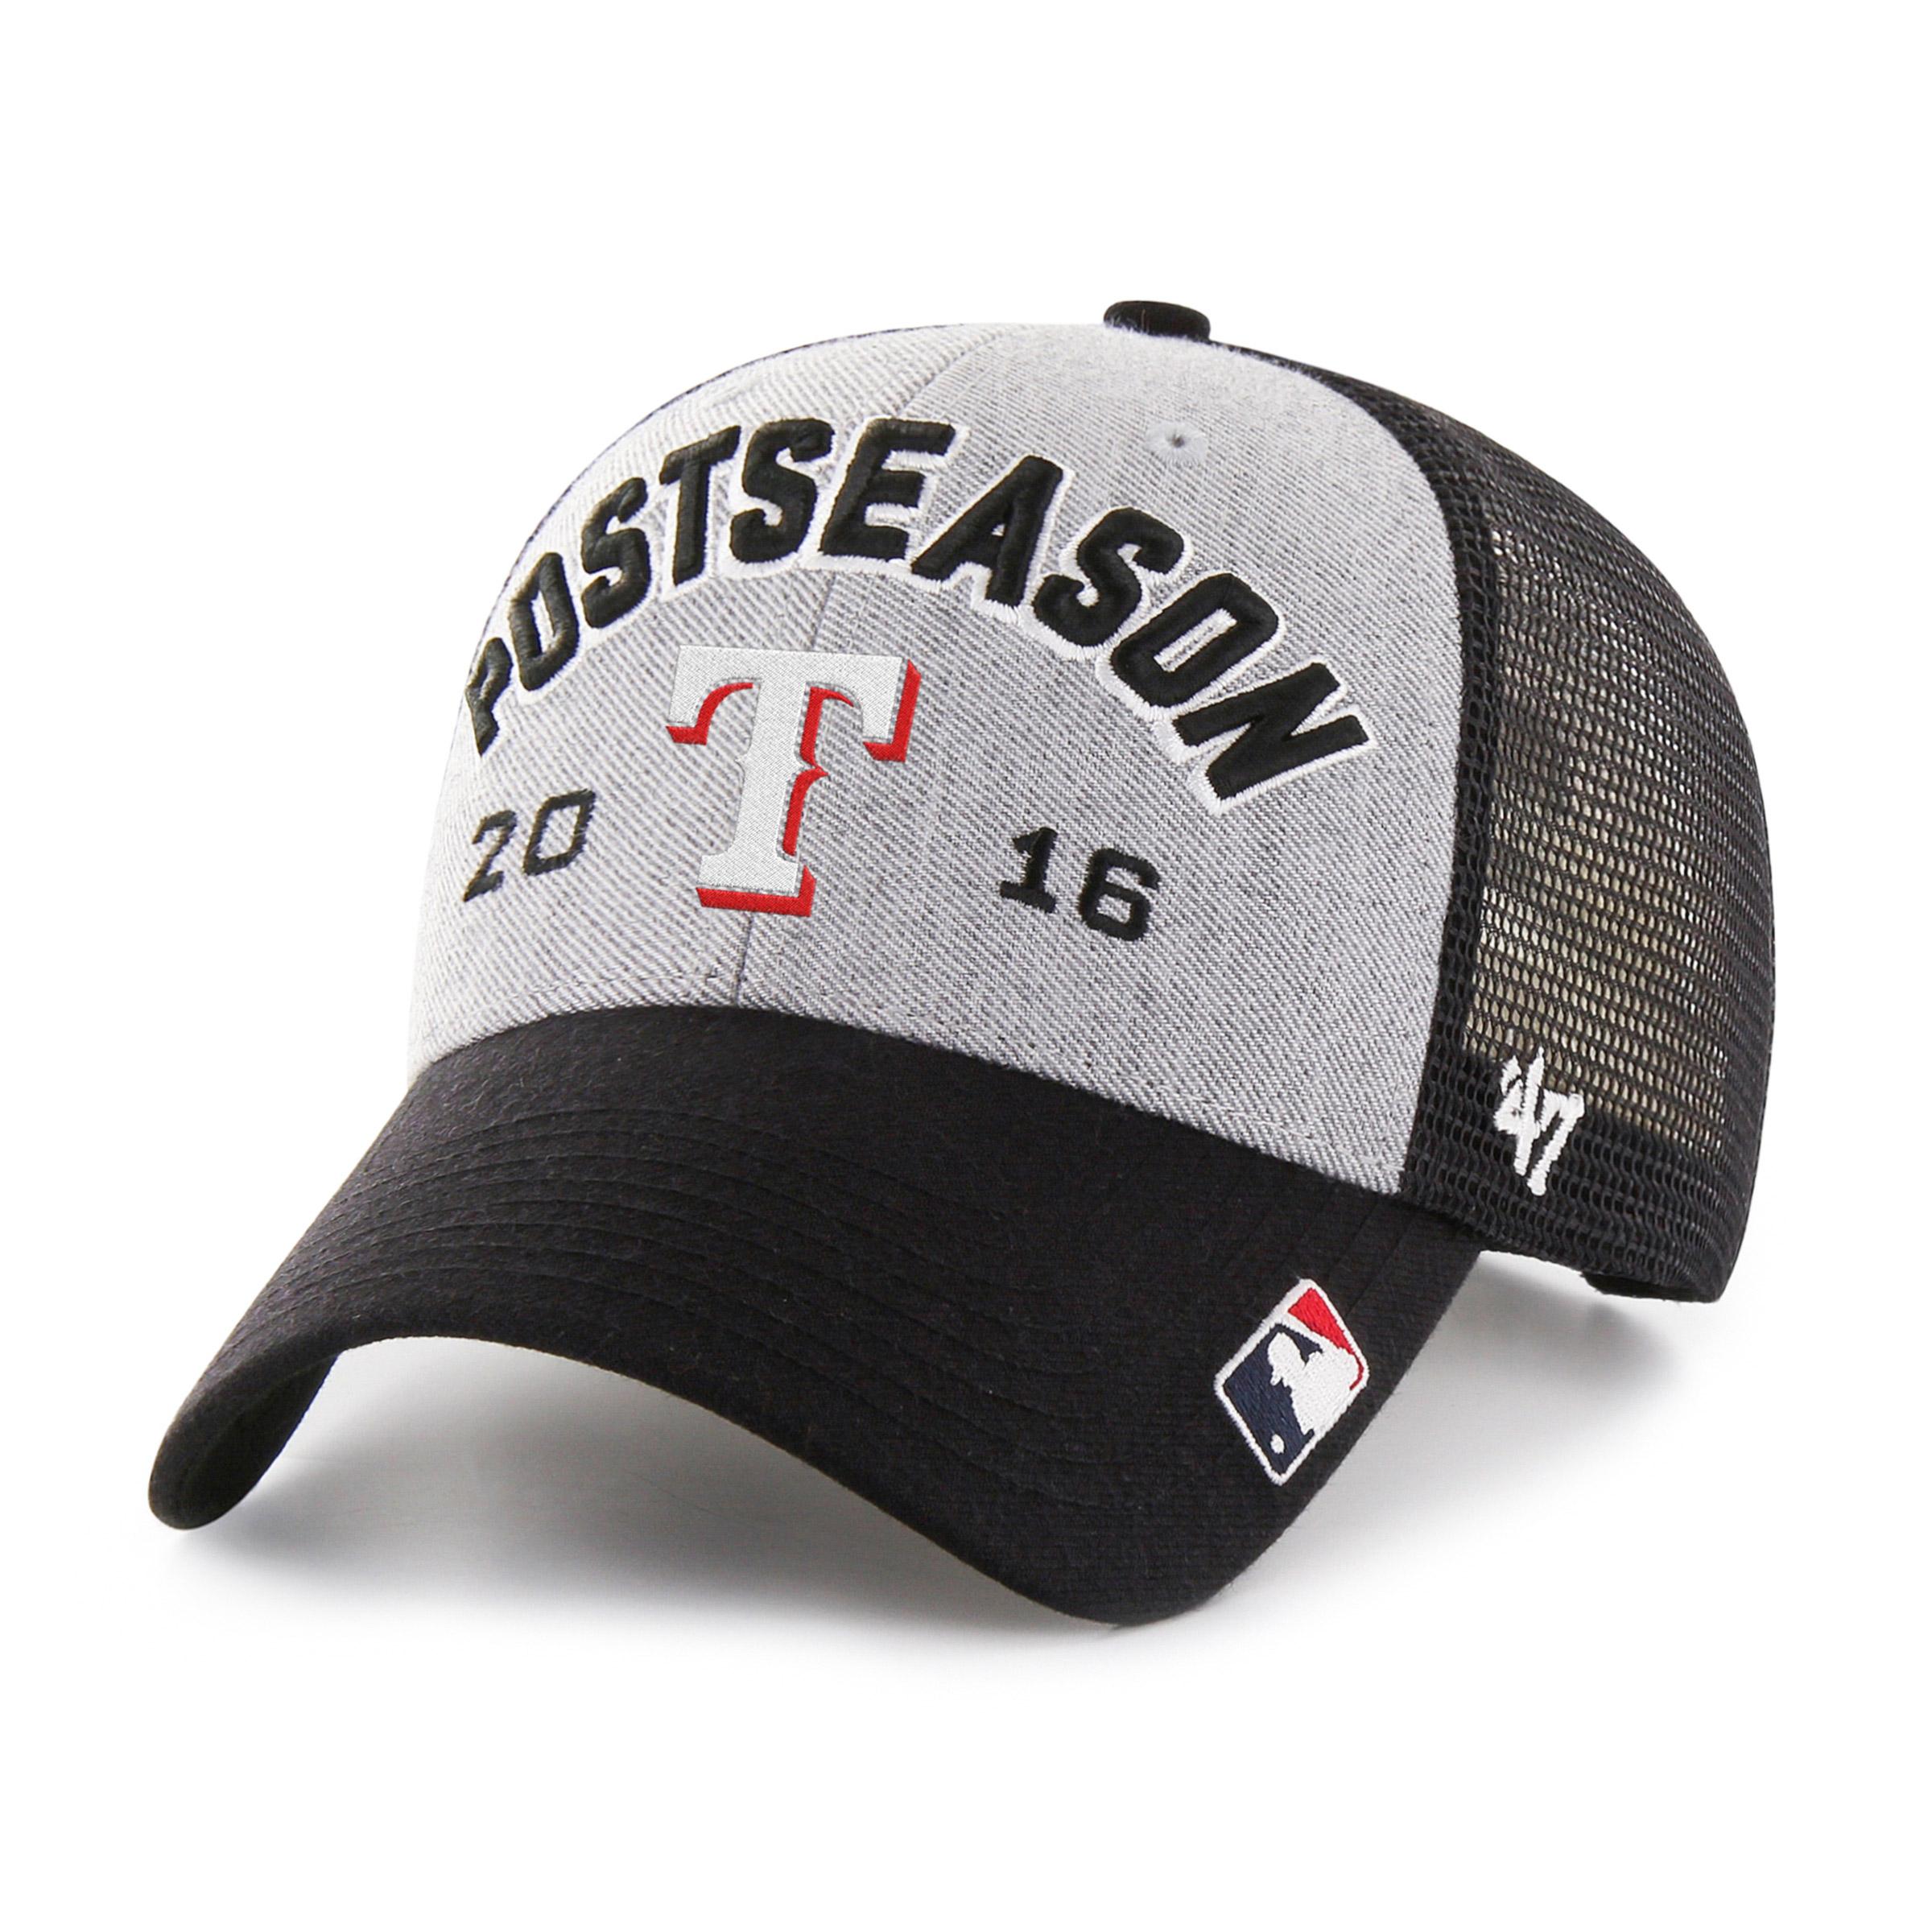 Texas Rangers '47 2016 AL West Division Champions Locker Room Adjustable Hat - Gray/Black - OSFA